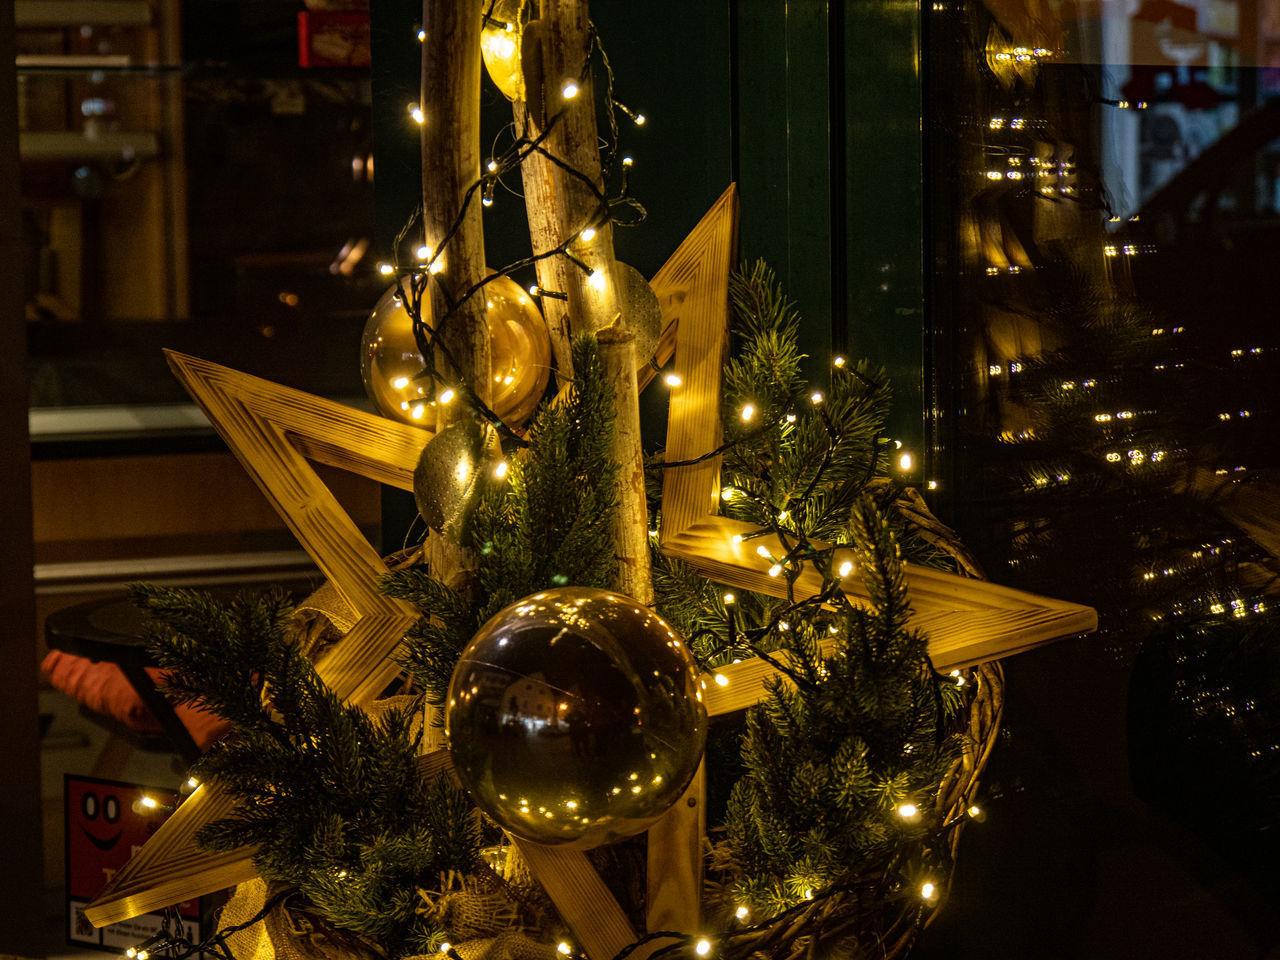 christmas, holiday, christmas tree, tree, celebration, decoration, illuminated, christmas decoration, christmas ornament, christmas lights, holiday - event, celebration event, indoors, night, no people, trip, religion, vacations